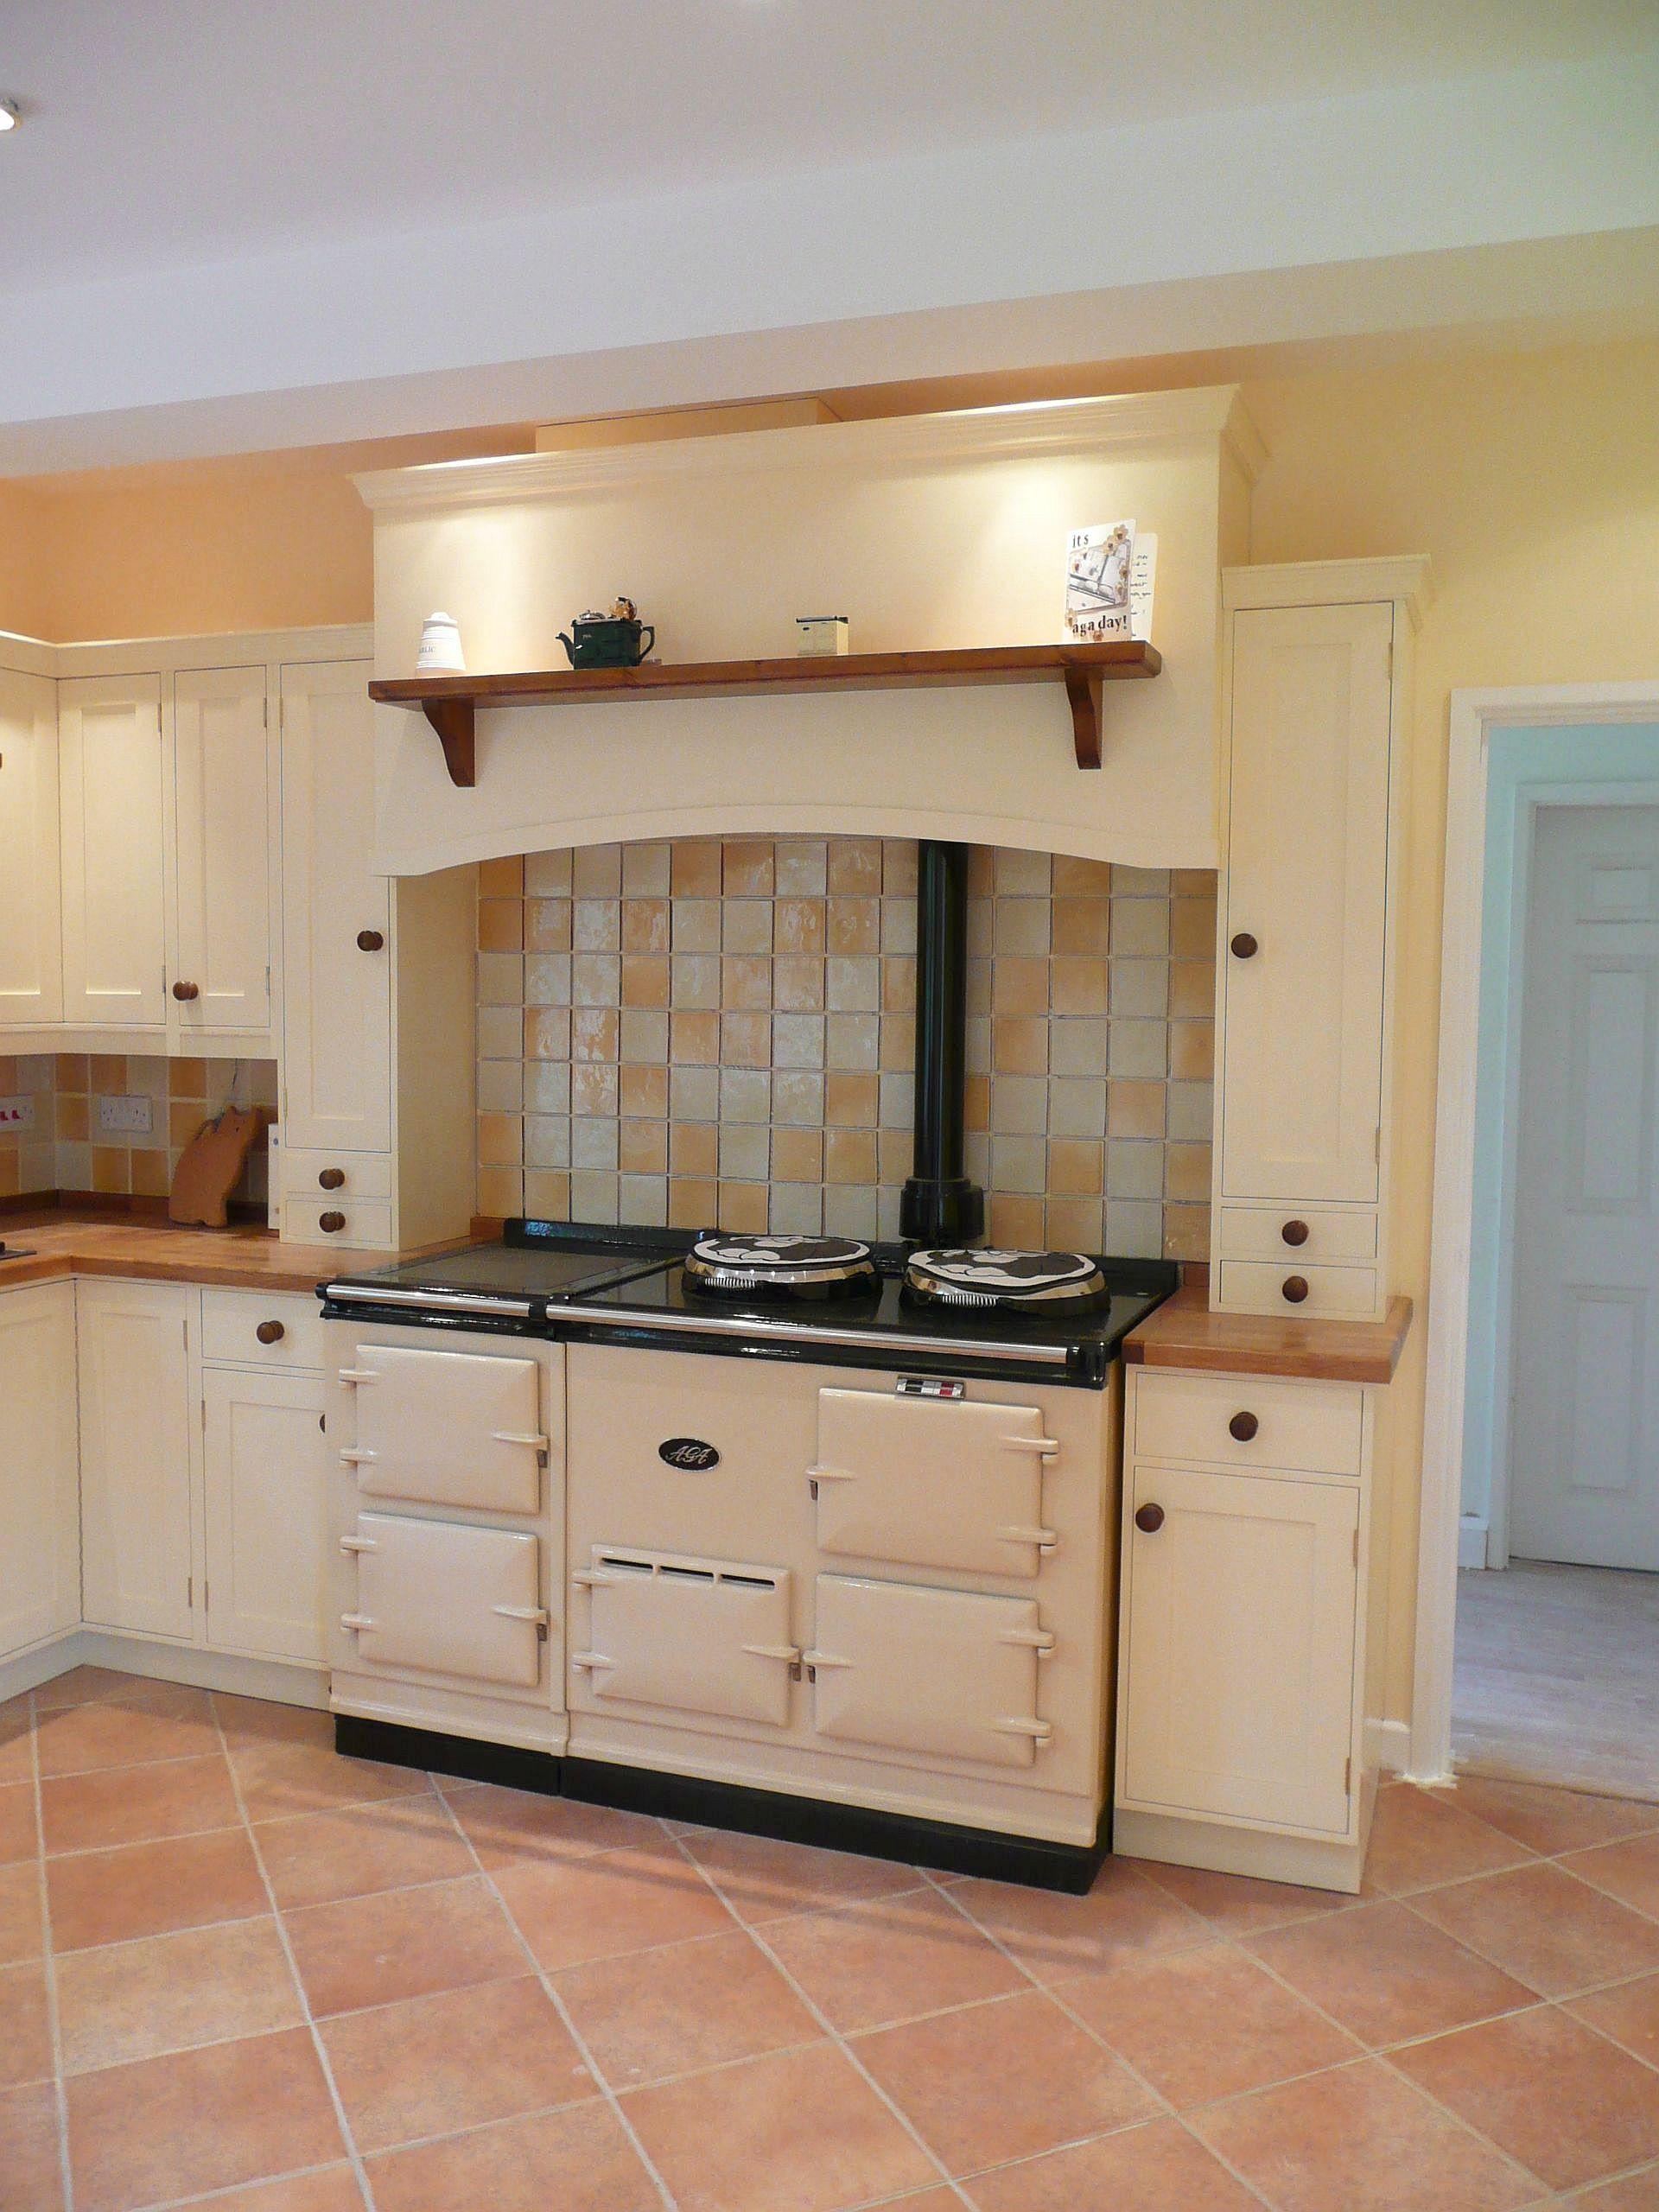 bespoke kitchen aga handmade wooden design ideas photo gallery beautiful kitchens bespoke kitchen aga handmade wooden design ideas photo gallery      rh   pinterest co uk